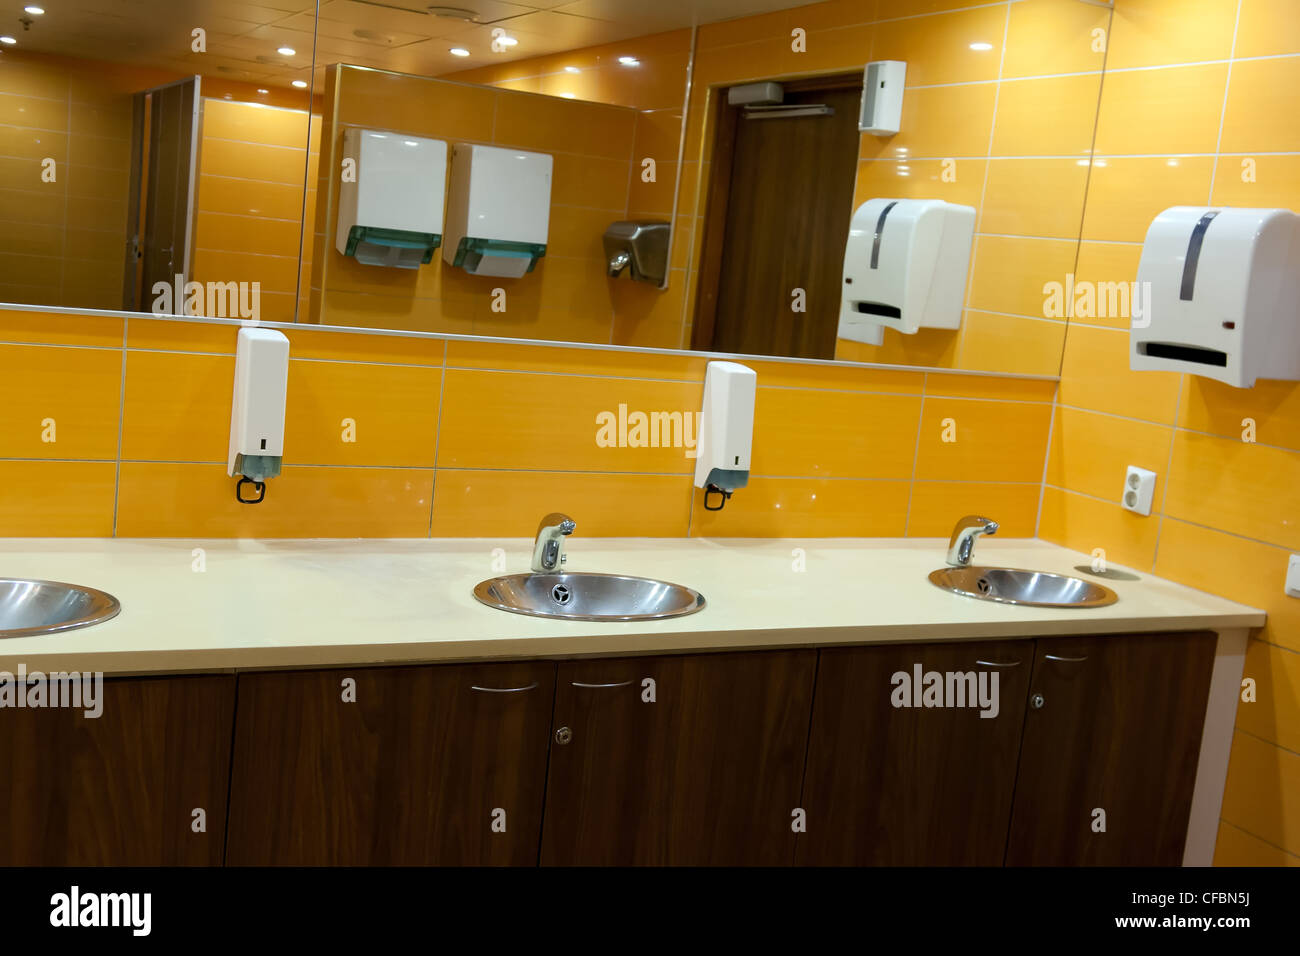 Toilet Bowl Walls Lavatory Bathroom Public Wc Stock Photos & Toilet ...